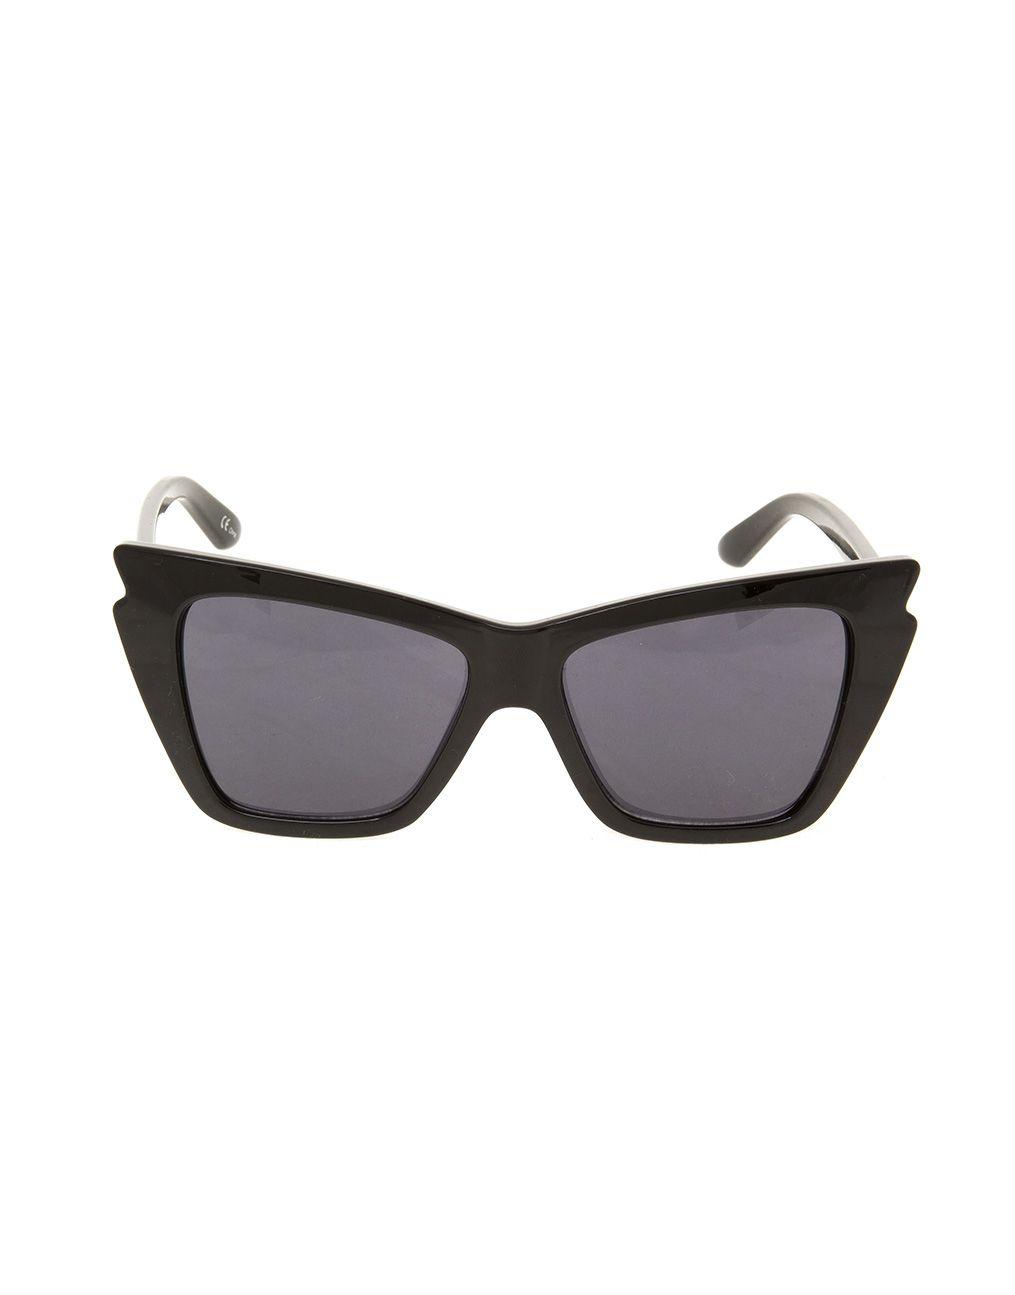 e47803a367c7c Trick or treat  Óculos Le Specs Rapture Black para o look de ...